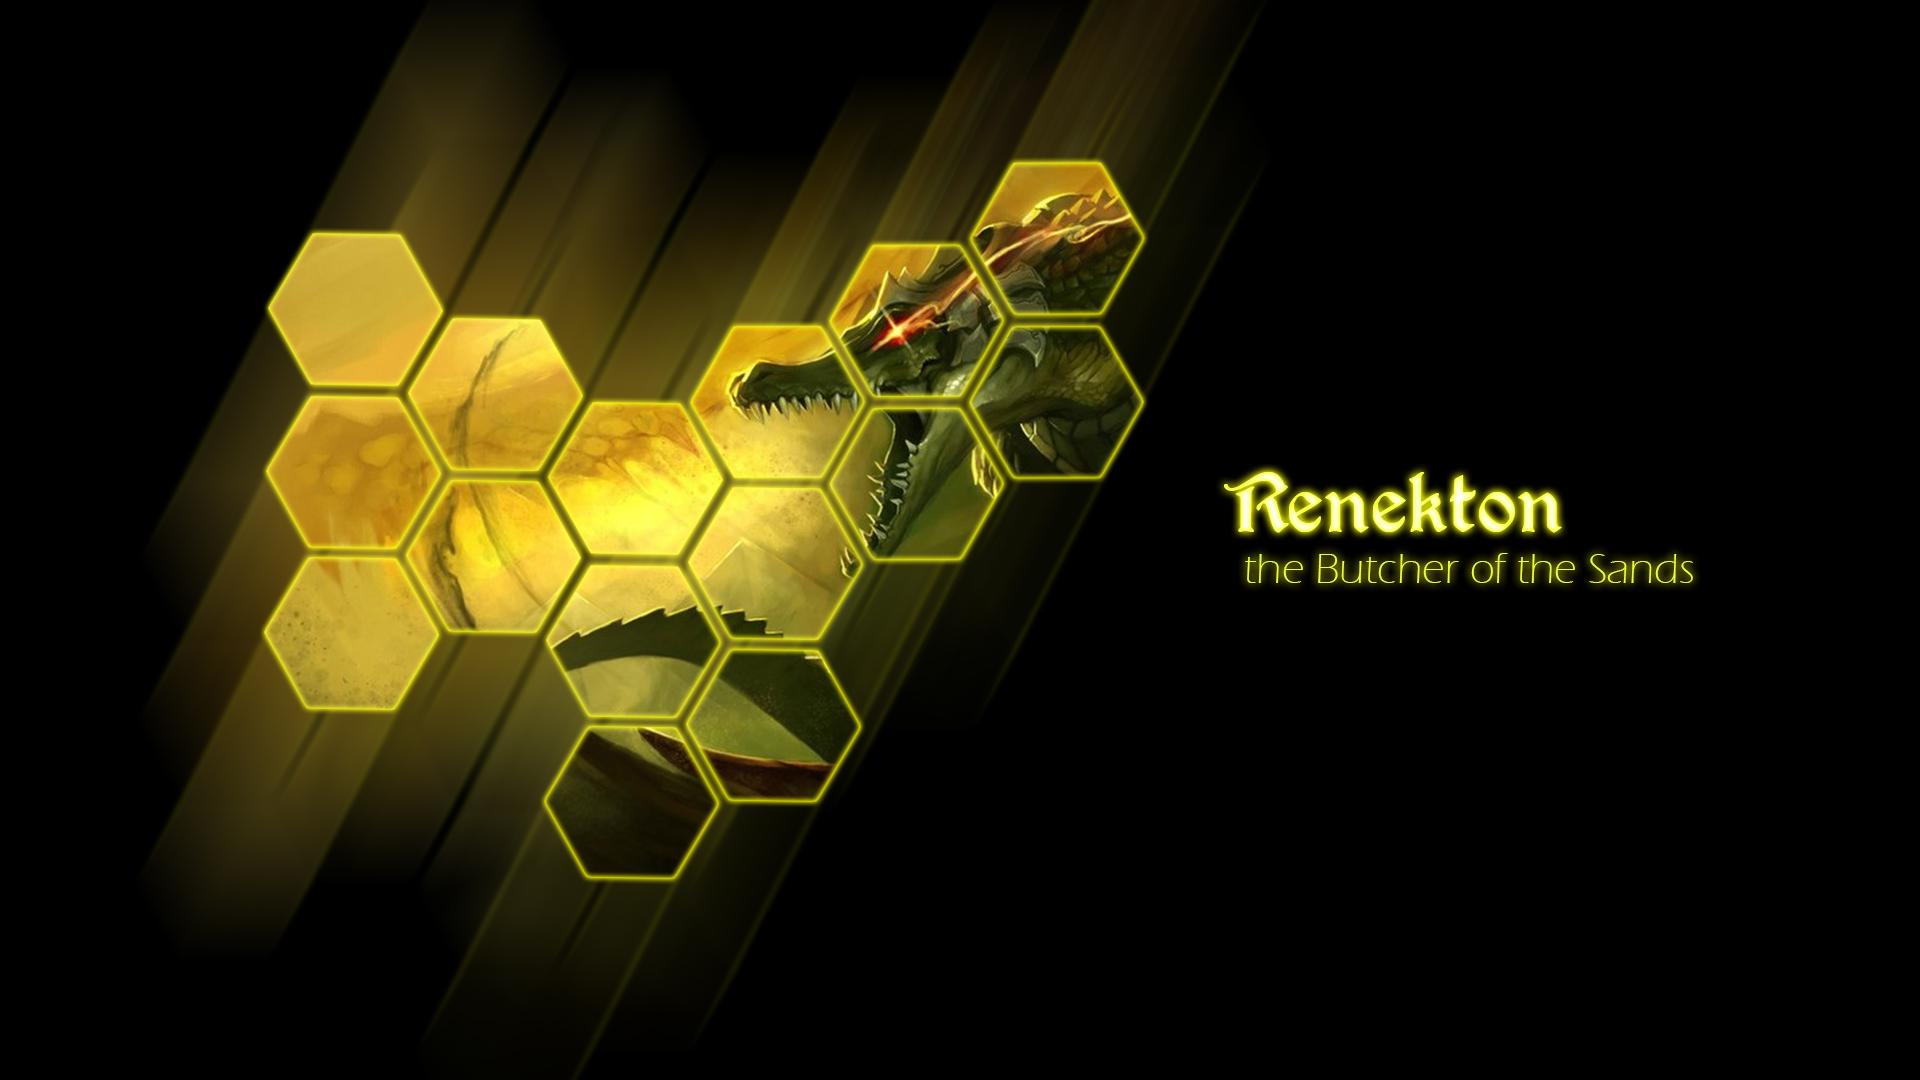 Renekton 1920x1080 24 Wallpaper HD